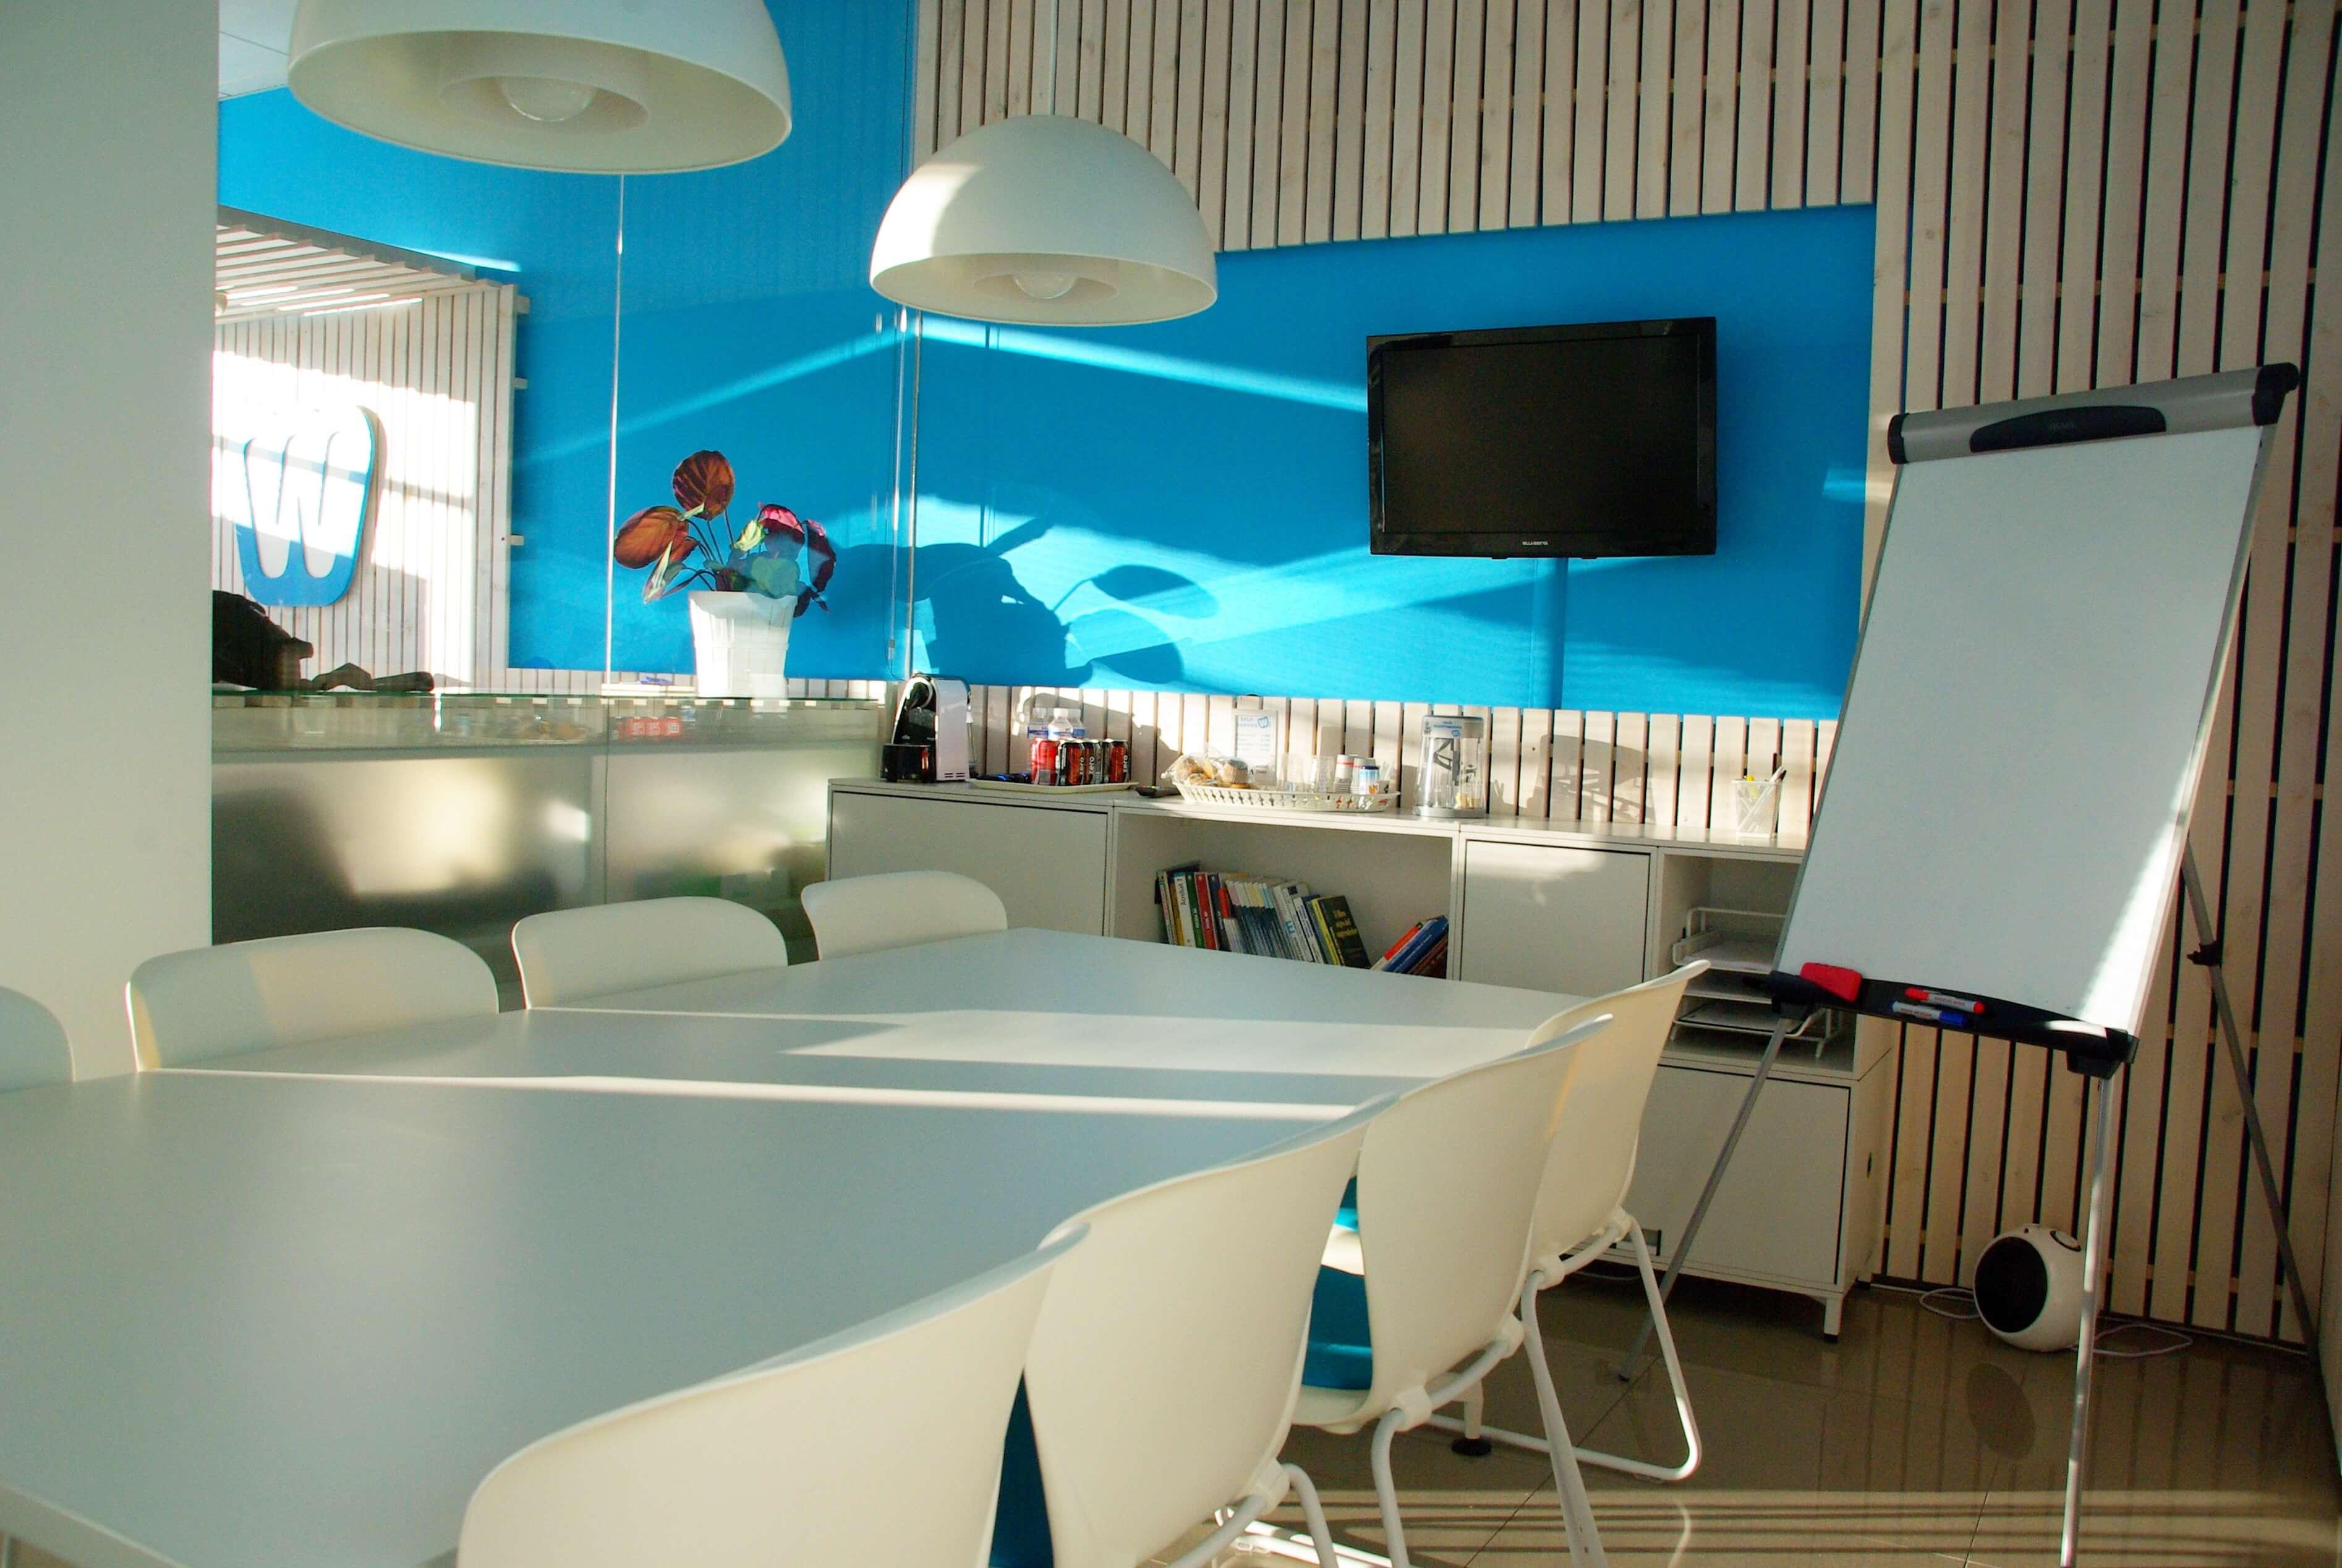 best office decor. pexels-photo-210620 best office decor snacknation